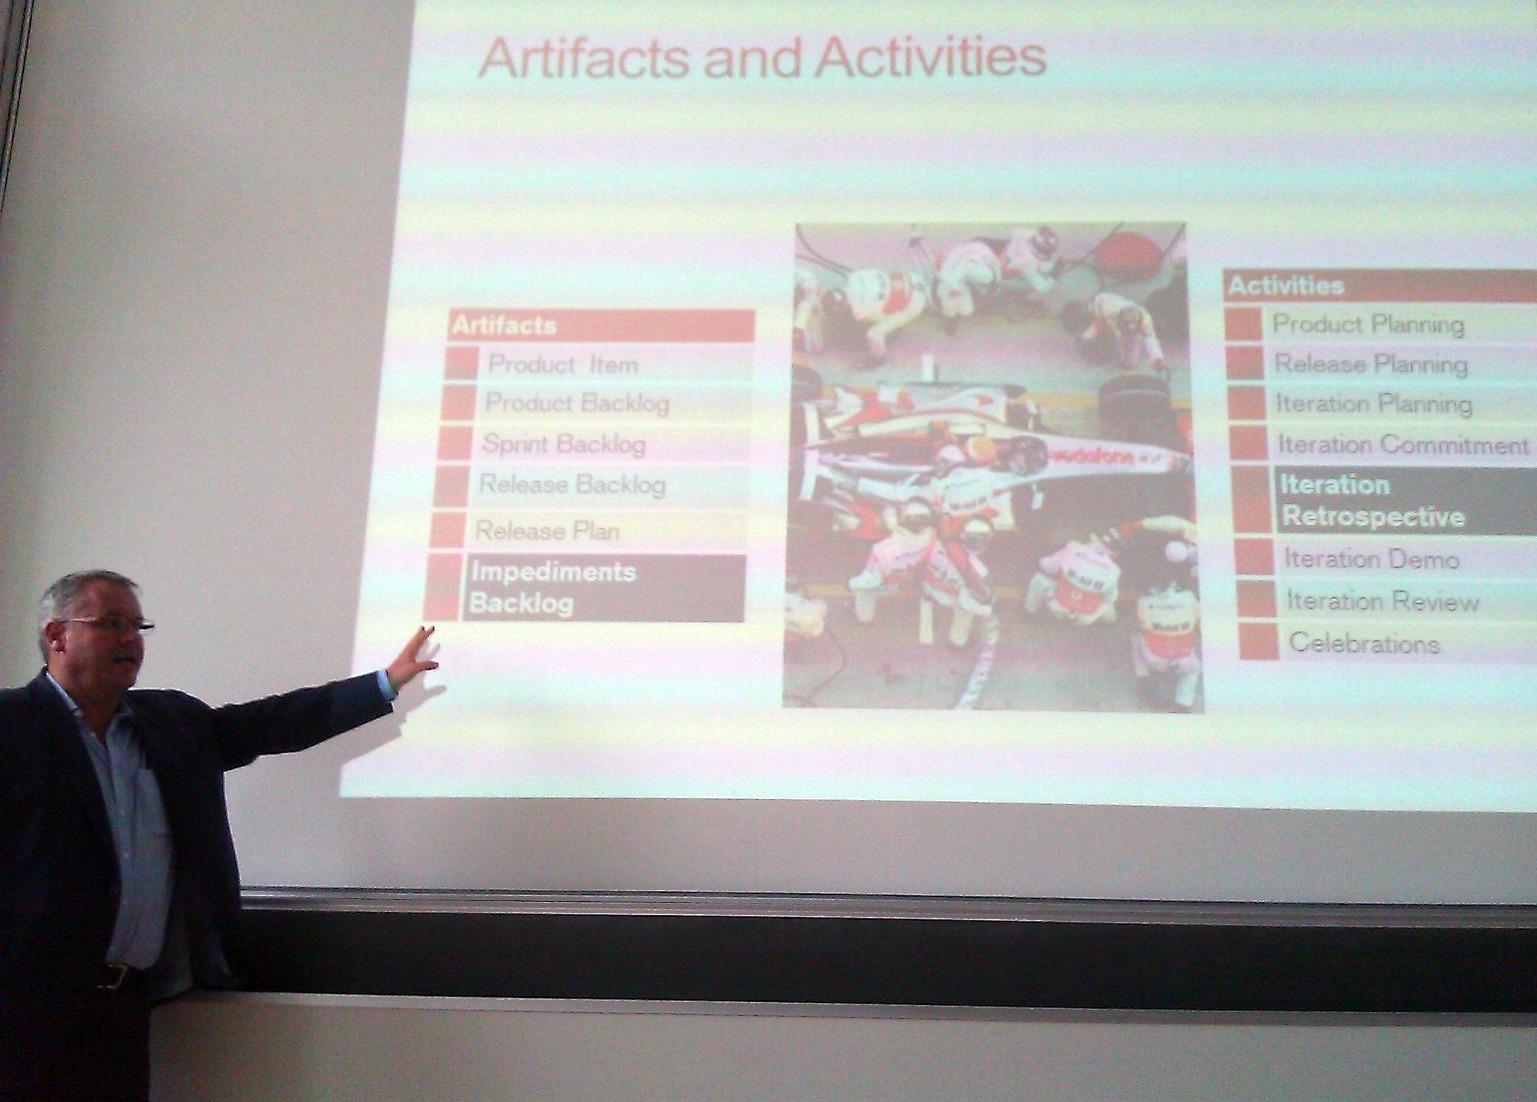 artifacts-activities-retrospectives-agile-shane-harrison